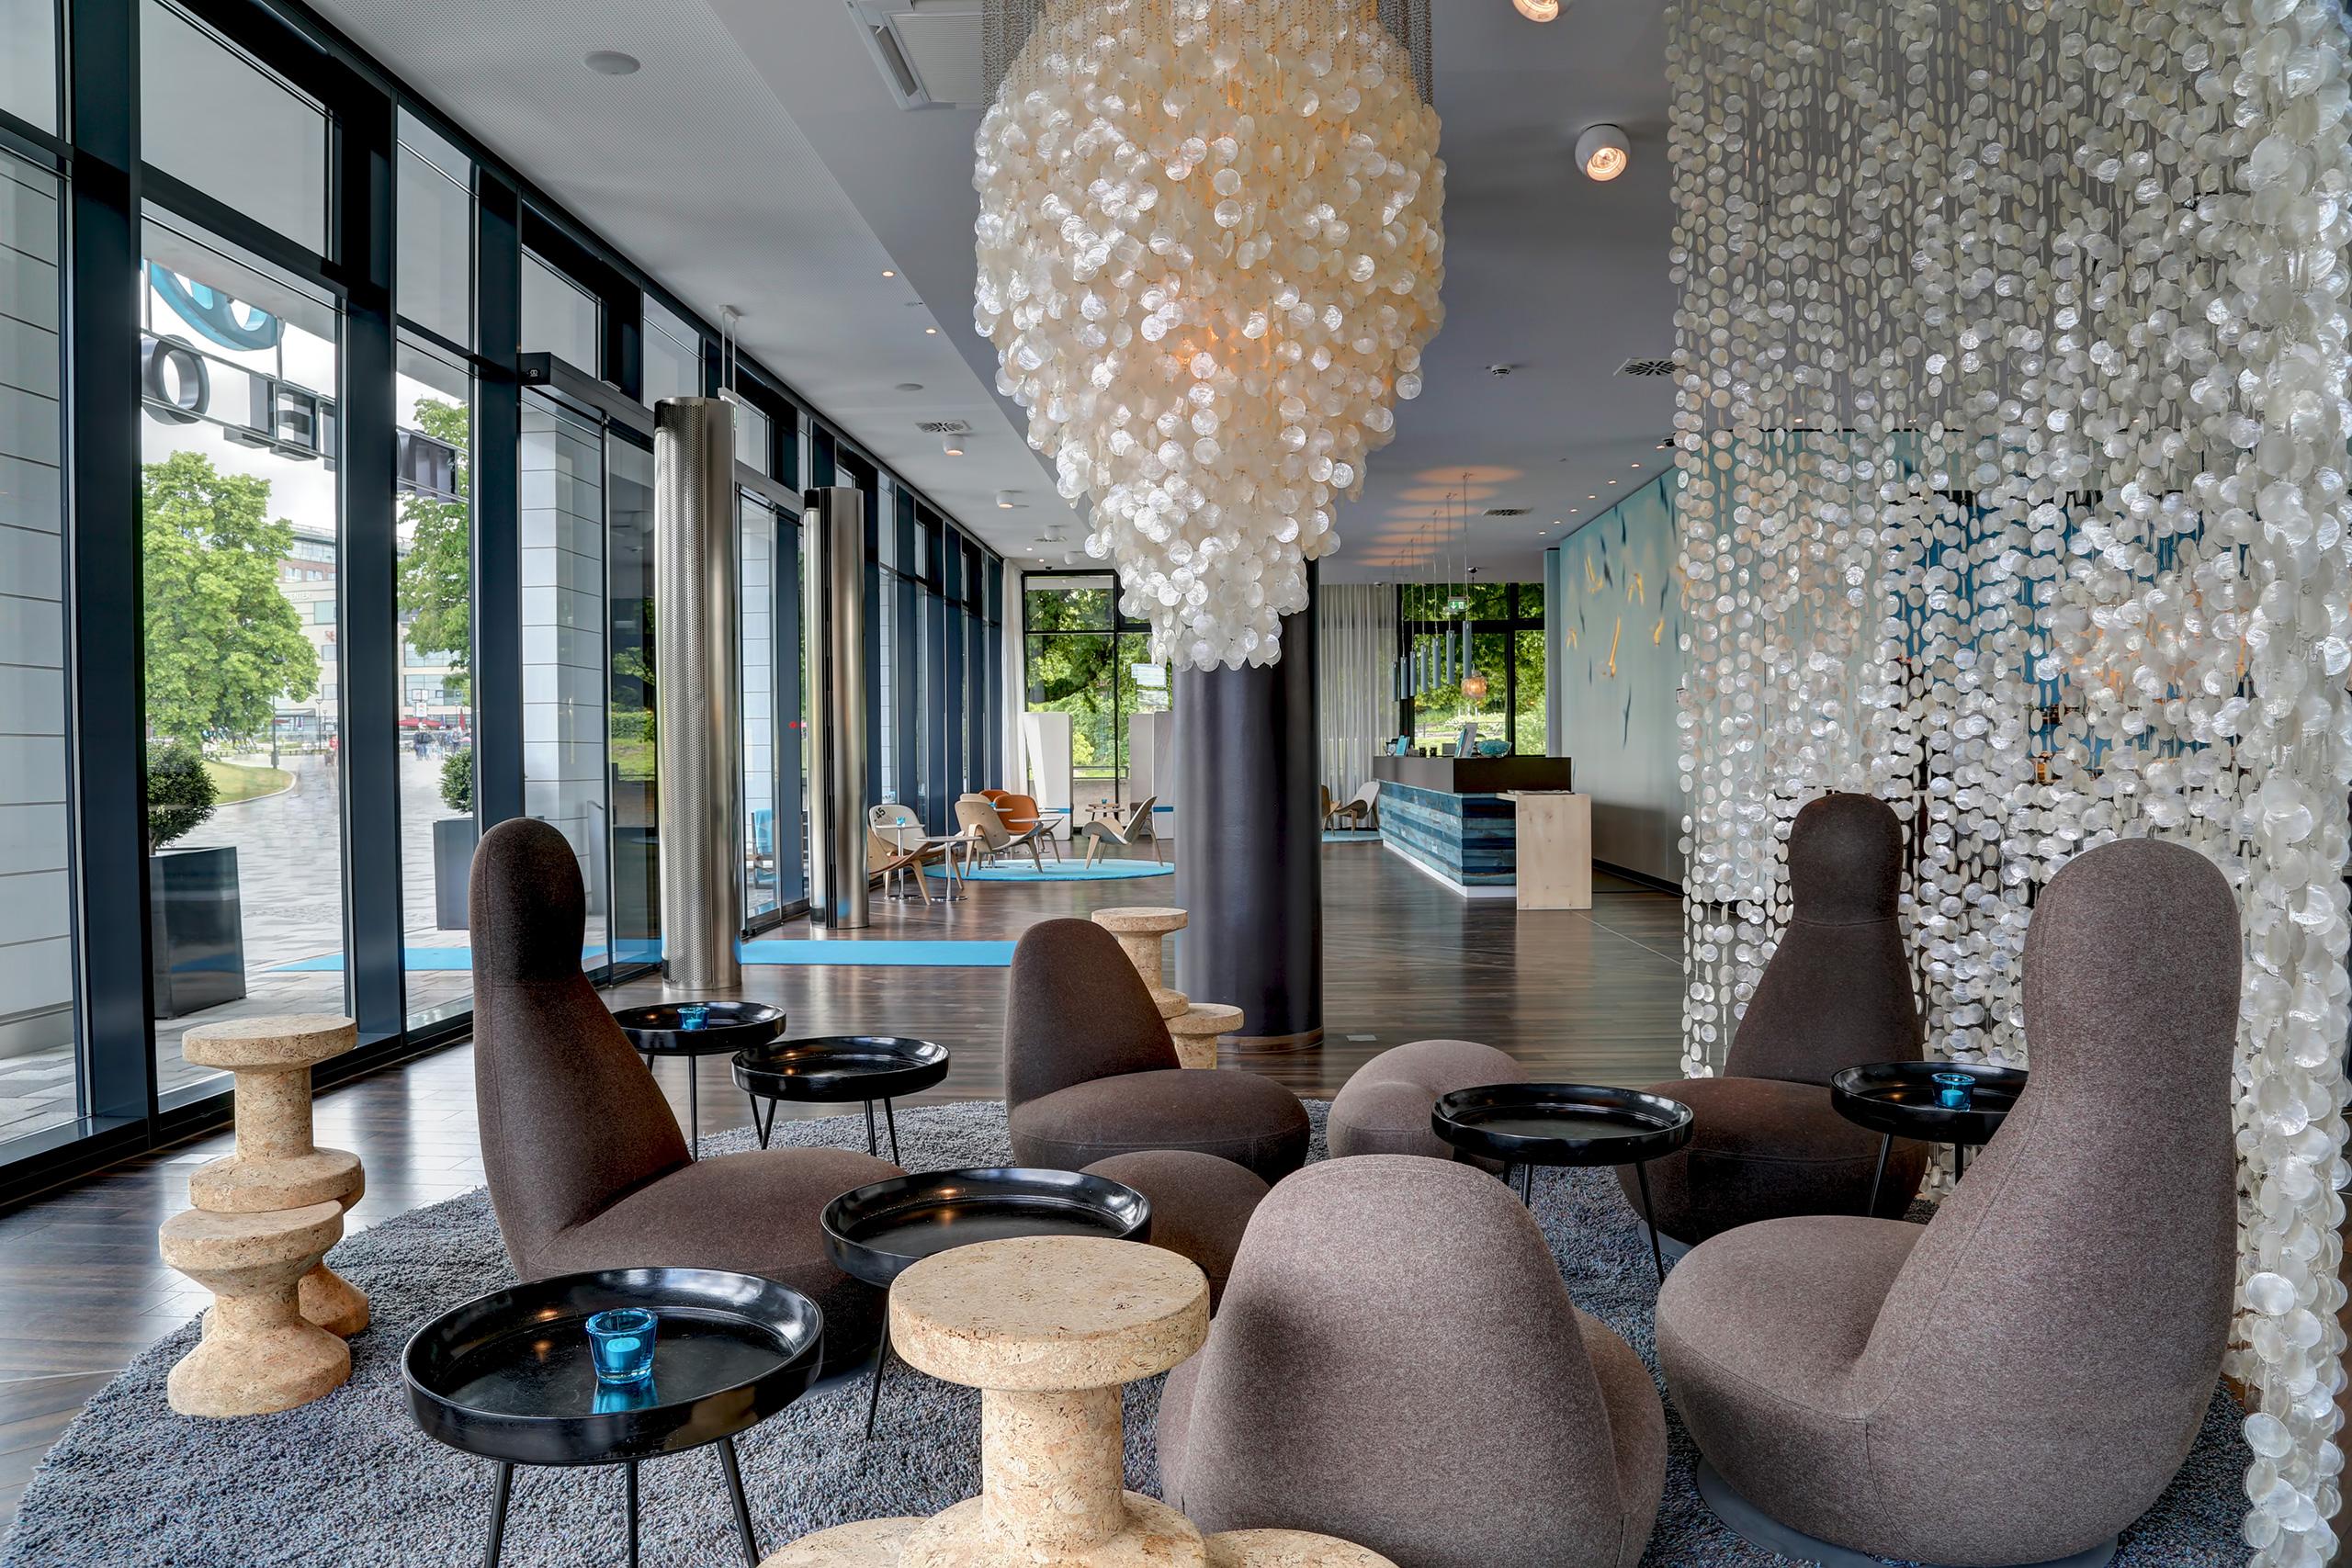 Hotel Rostock Motel One | design hotels Rostock